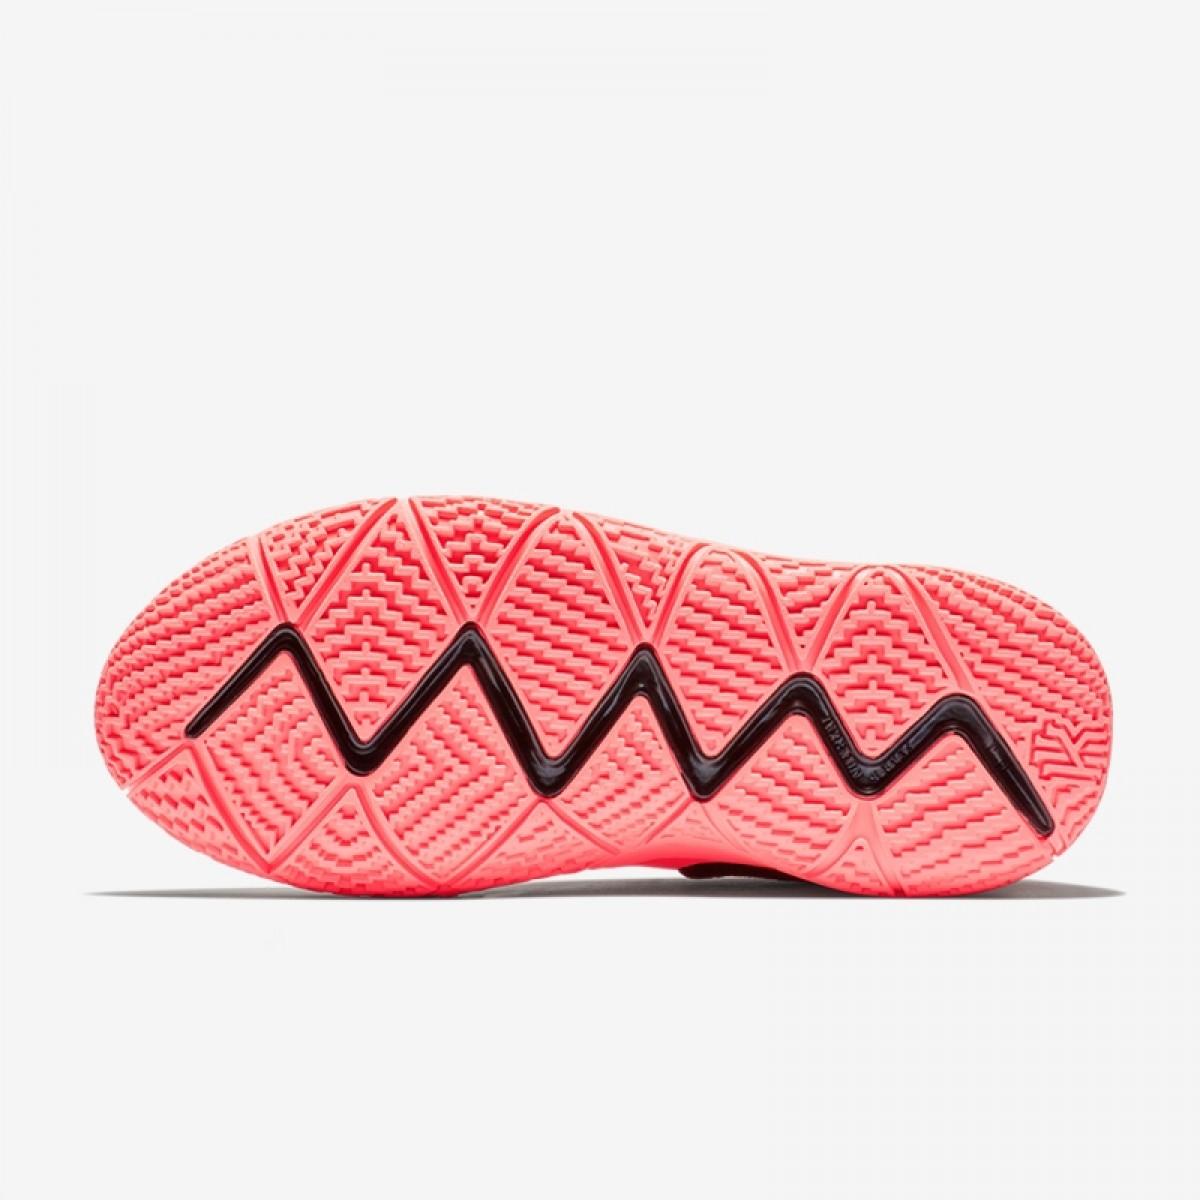 super popular 1ec5a fe116 Nike Kyrie 4 GS 'Atomic Pink'